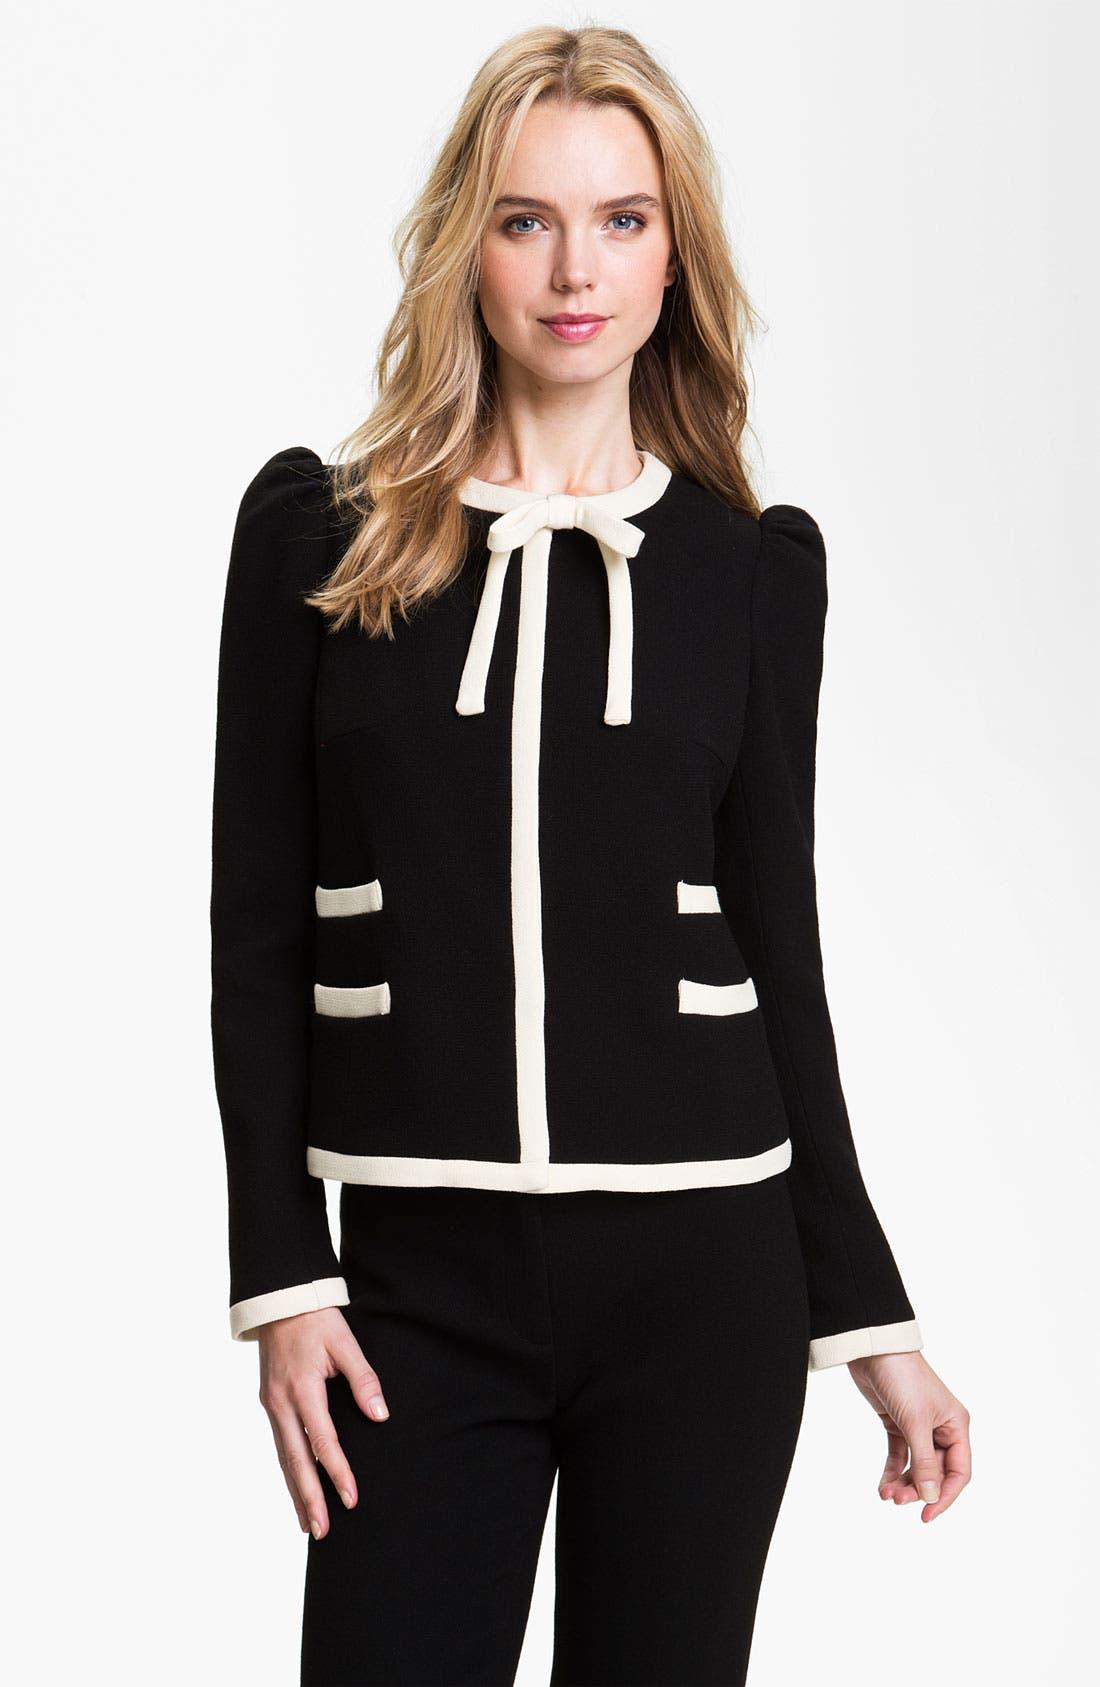 Alternate Image 1 Selected - Milly 'Marizia' Bow Detail Jacket